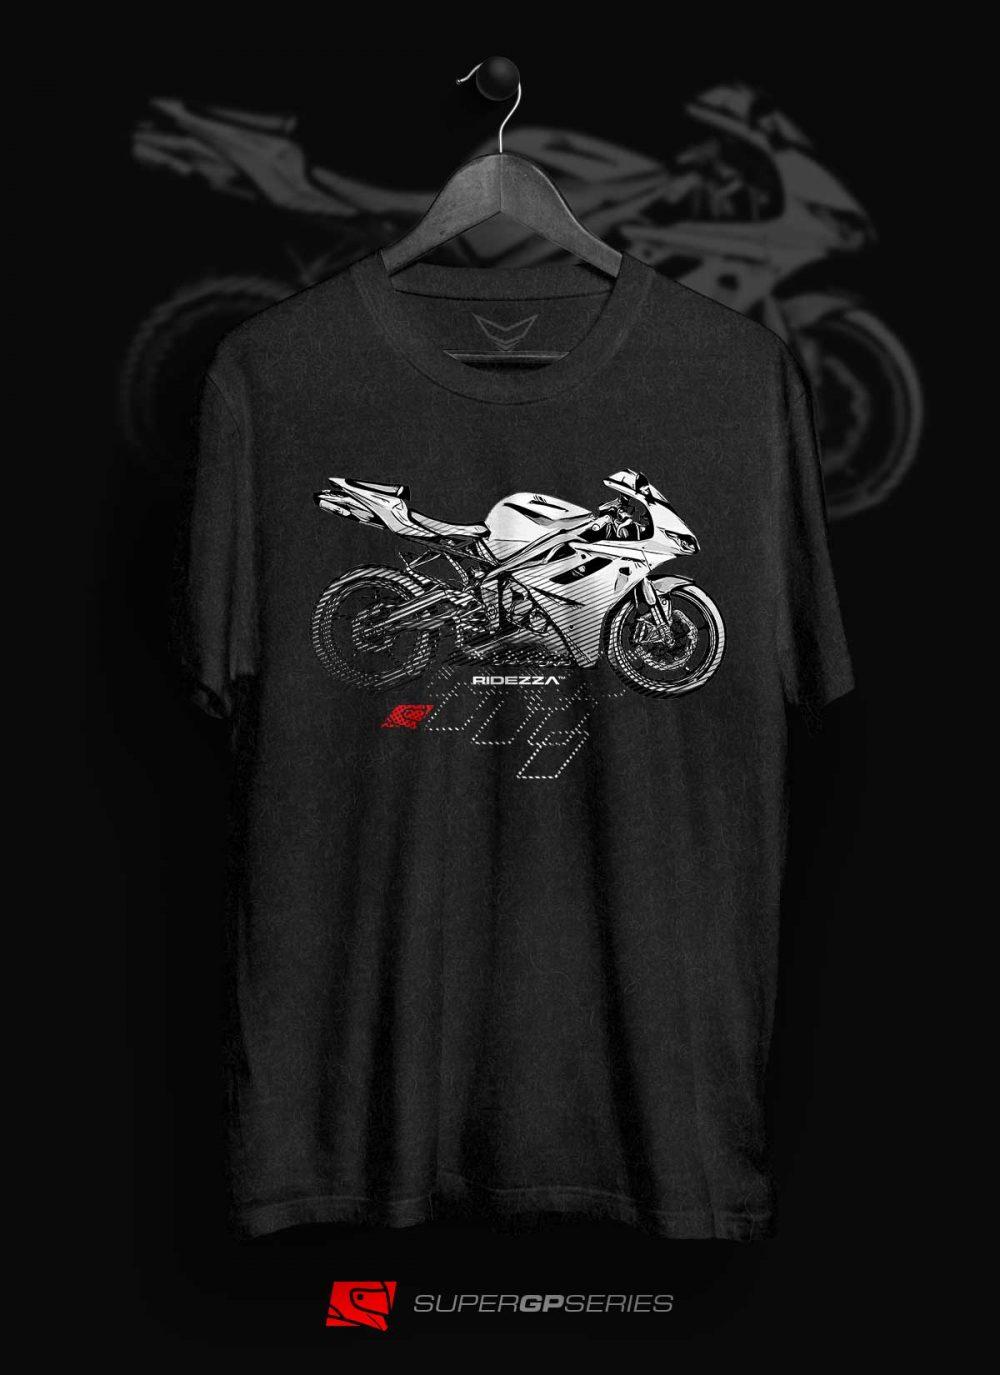 Daytona 675 SuperGP Series T-Shirt